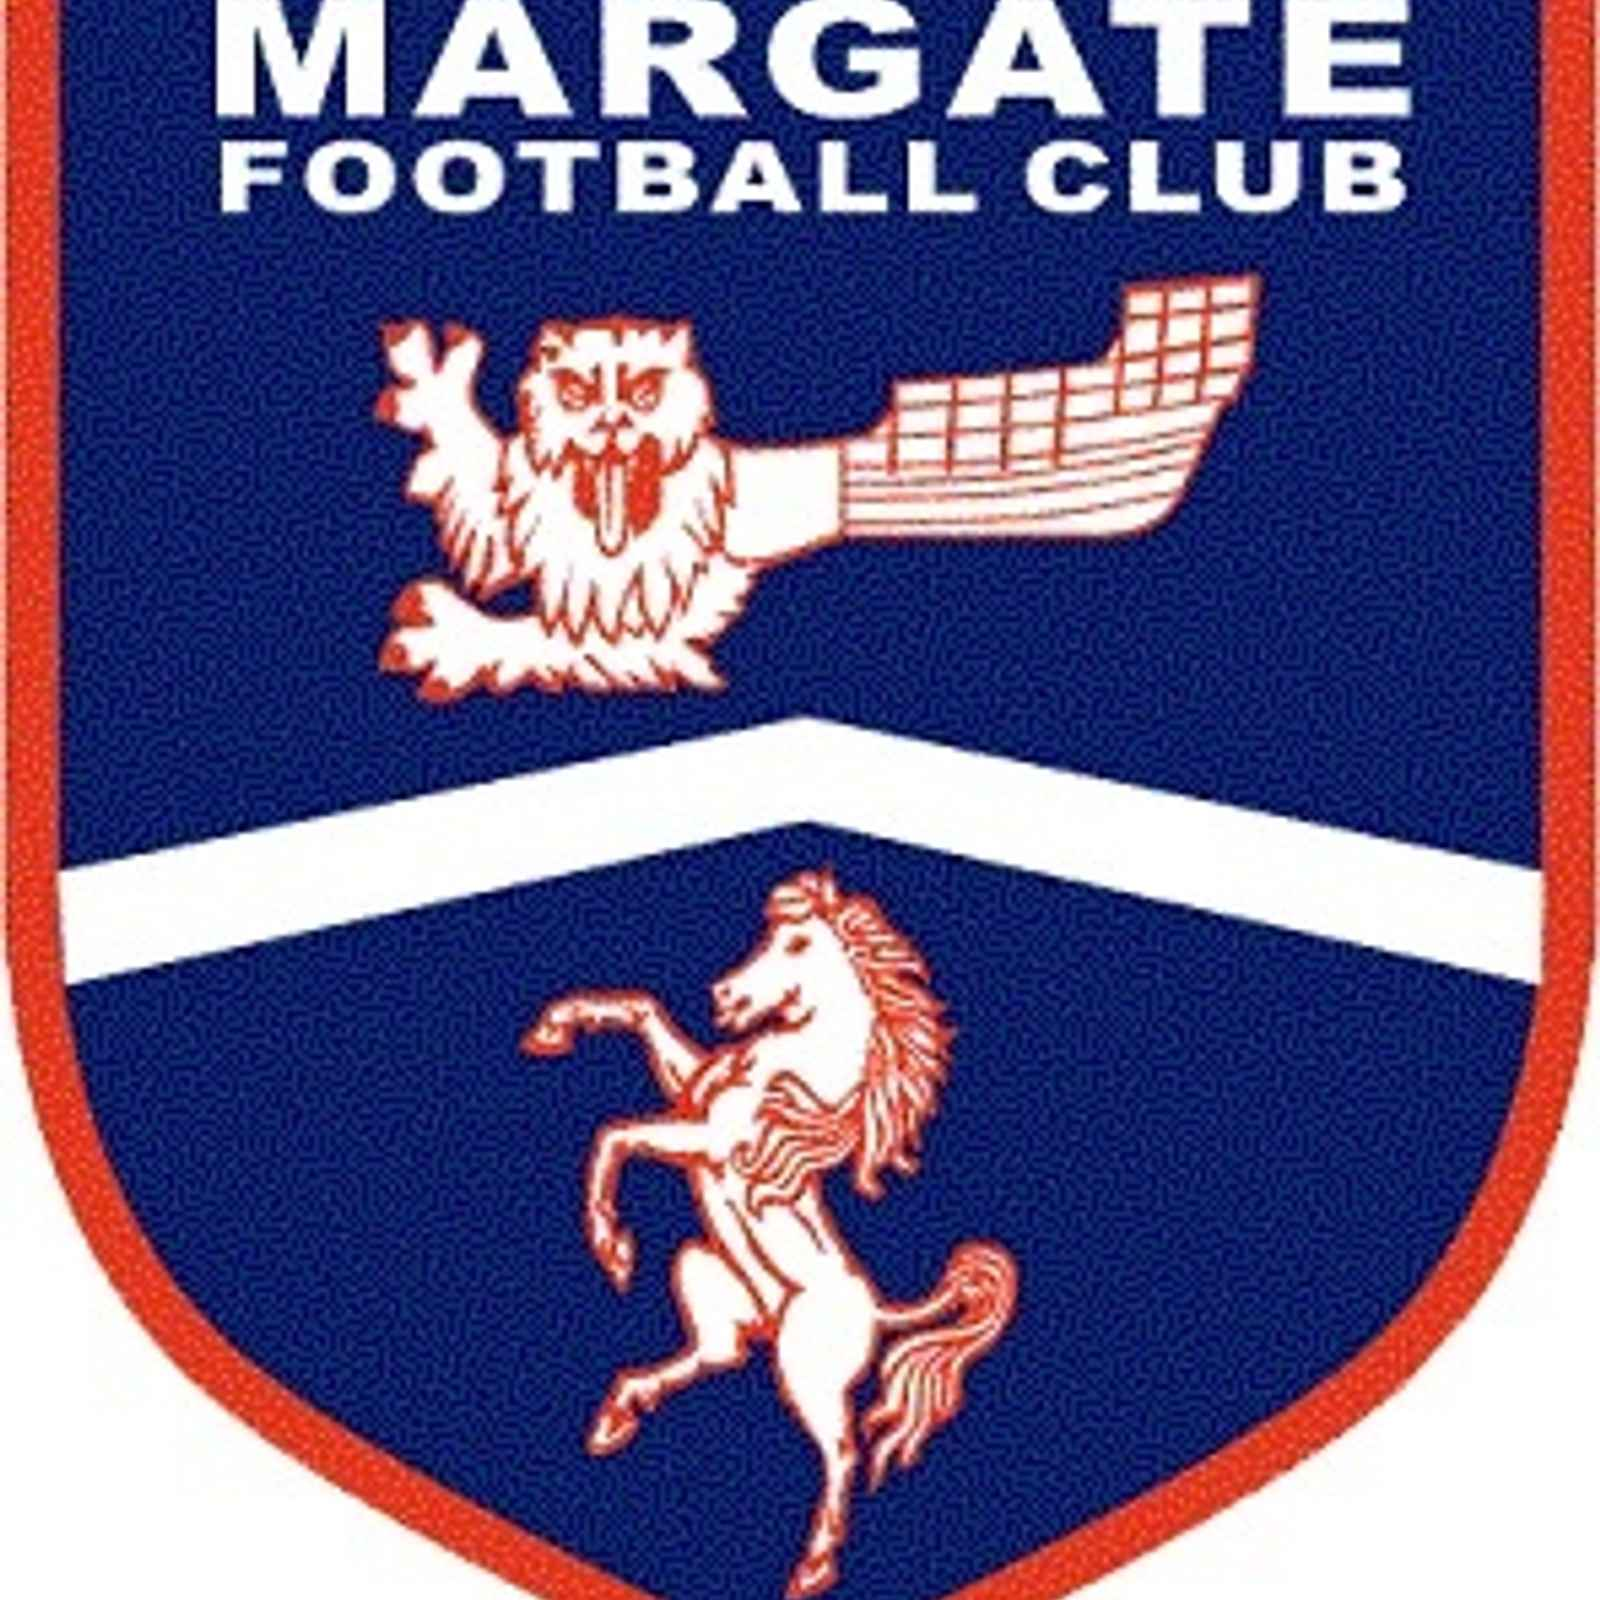 Next friendly Saturday 23rd July away versus Margate, kick off 3pm